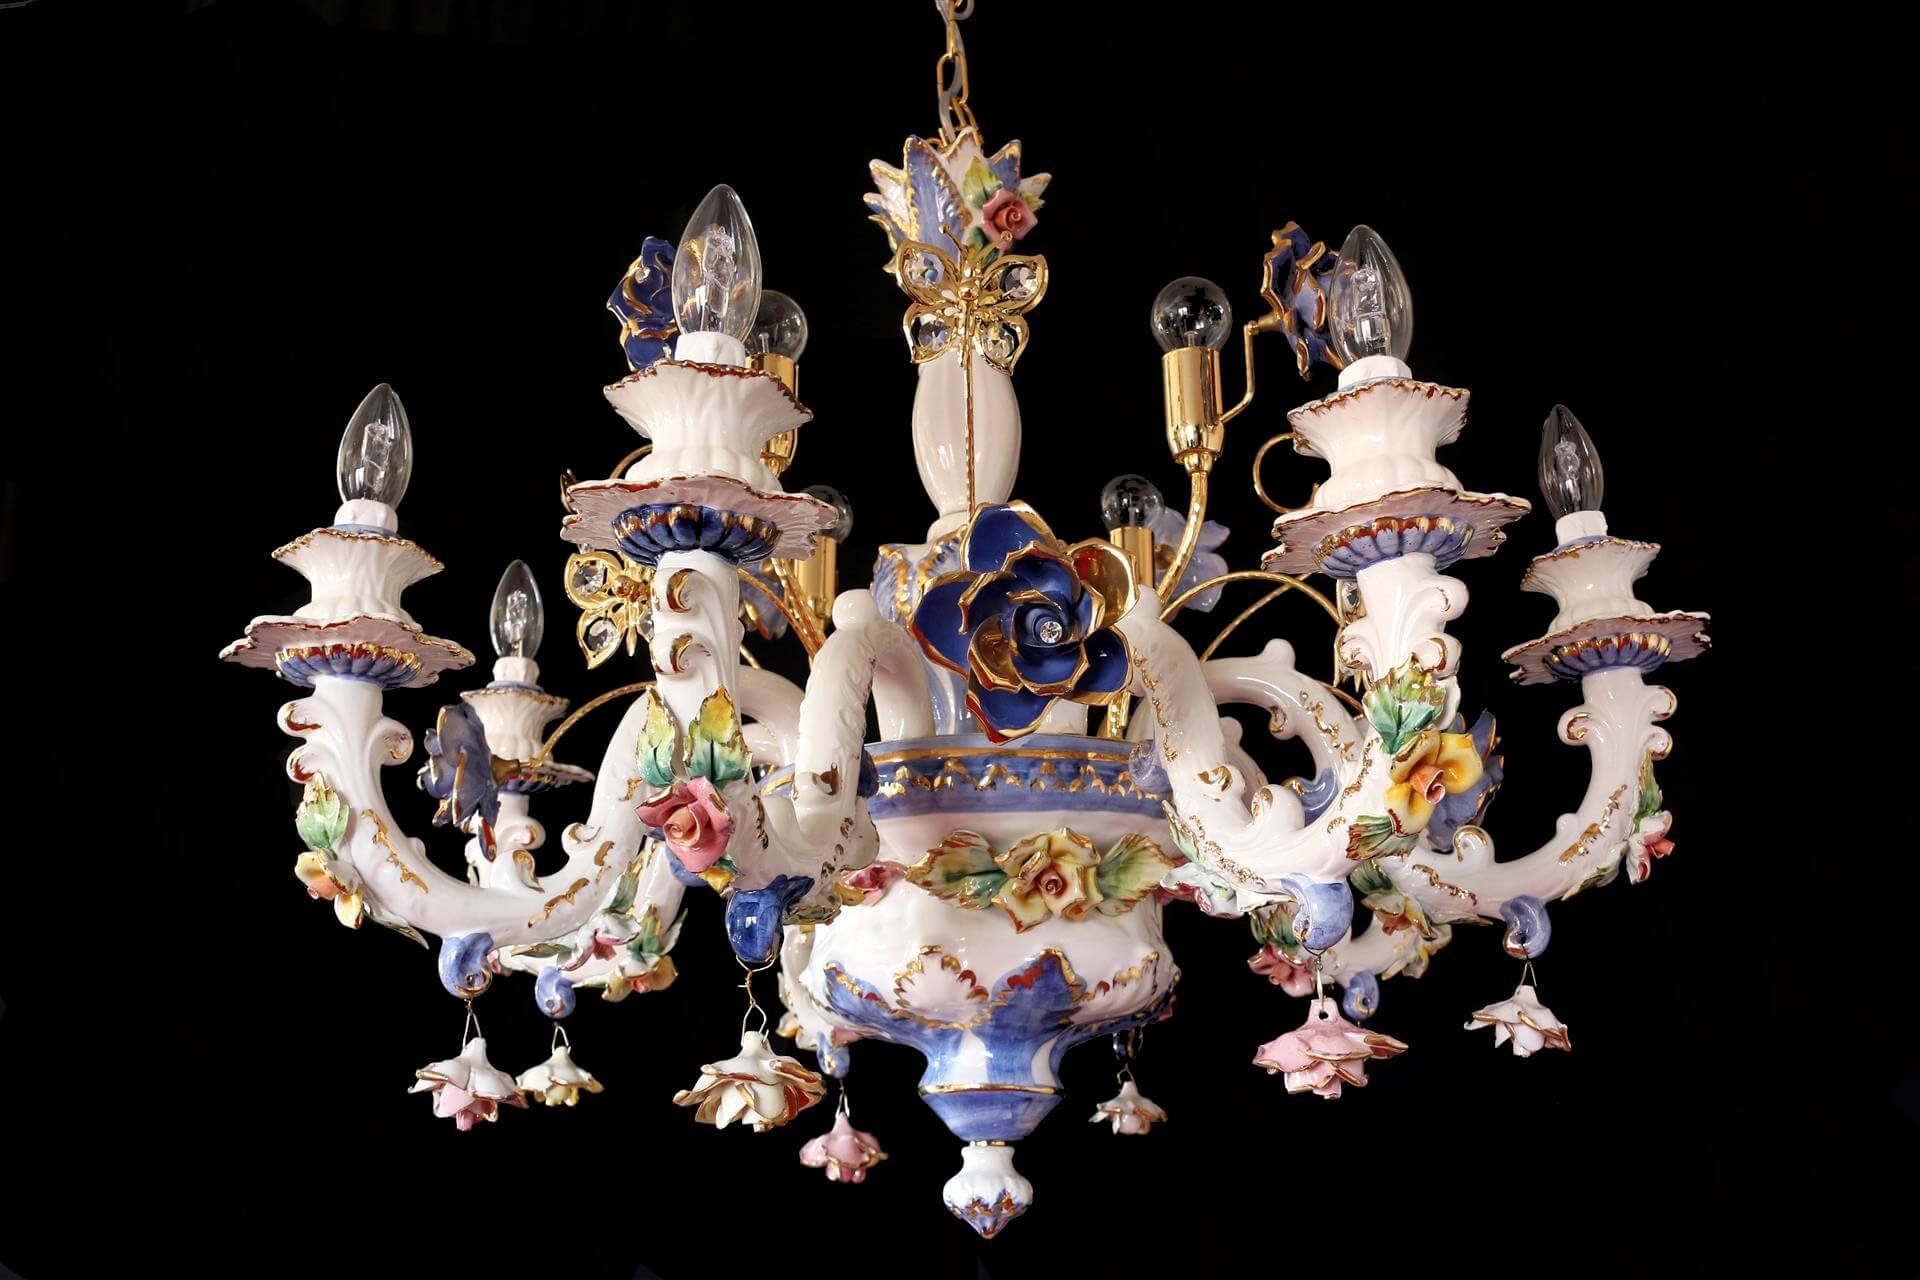 Lampadario Ceramica Di Bassano.Lampadario Ceramica Di Bassano Del Grappa Bassano Lampada In